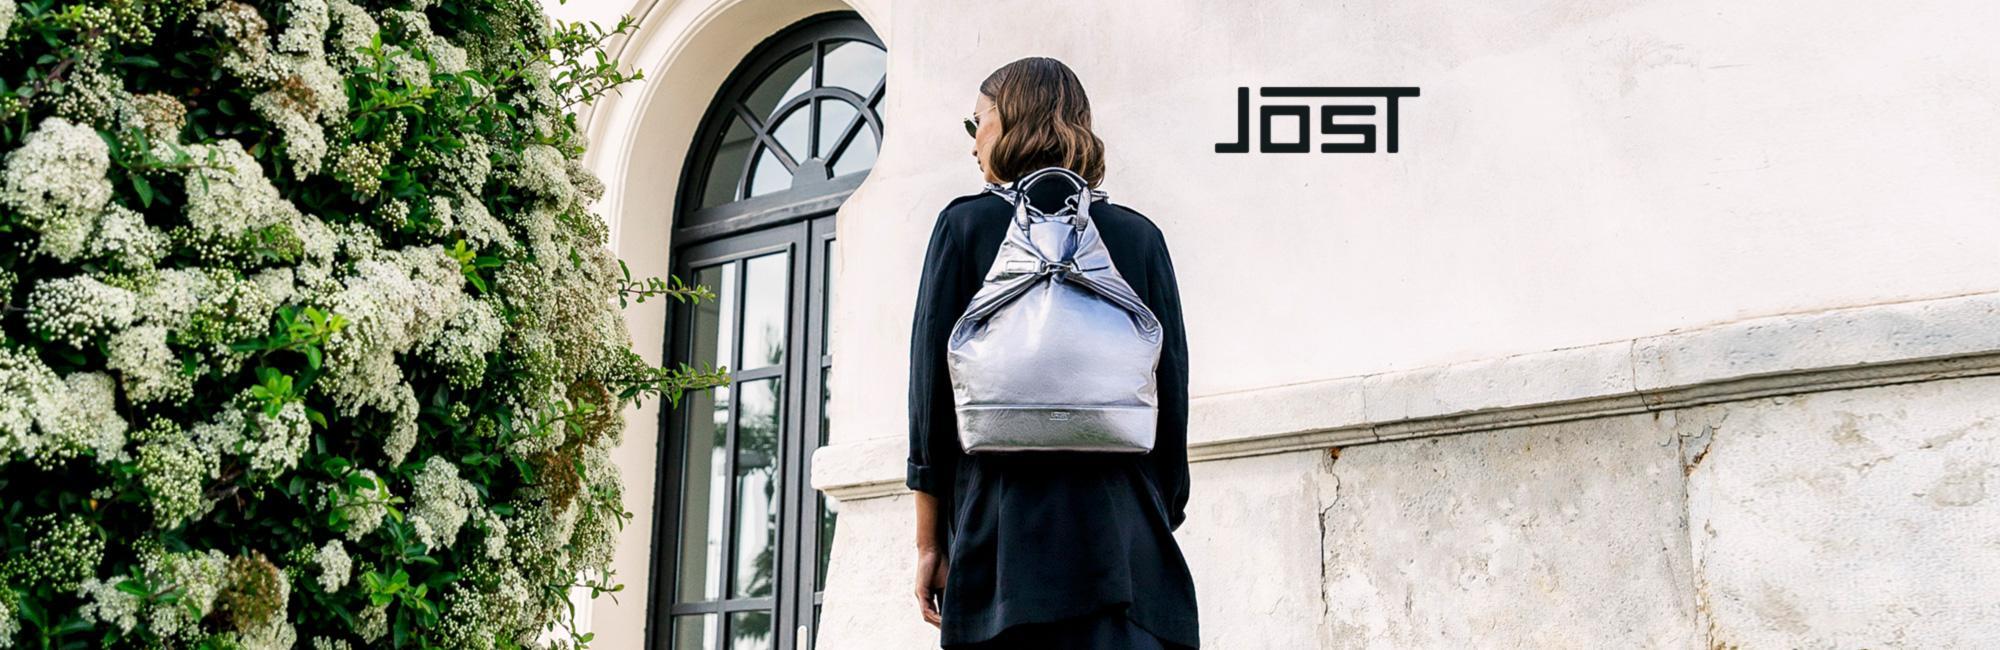 0dac7fc34fc0a Jost Bags